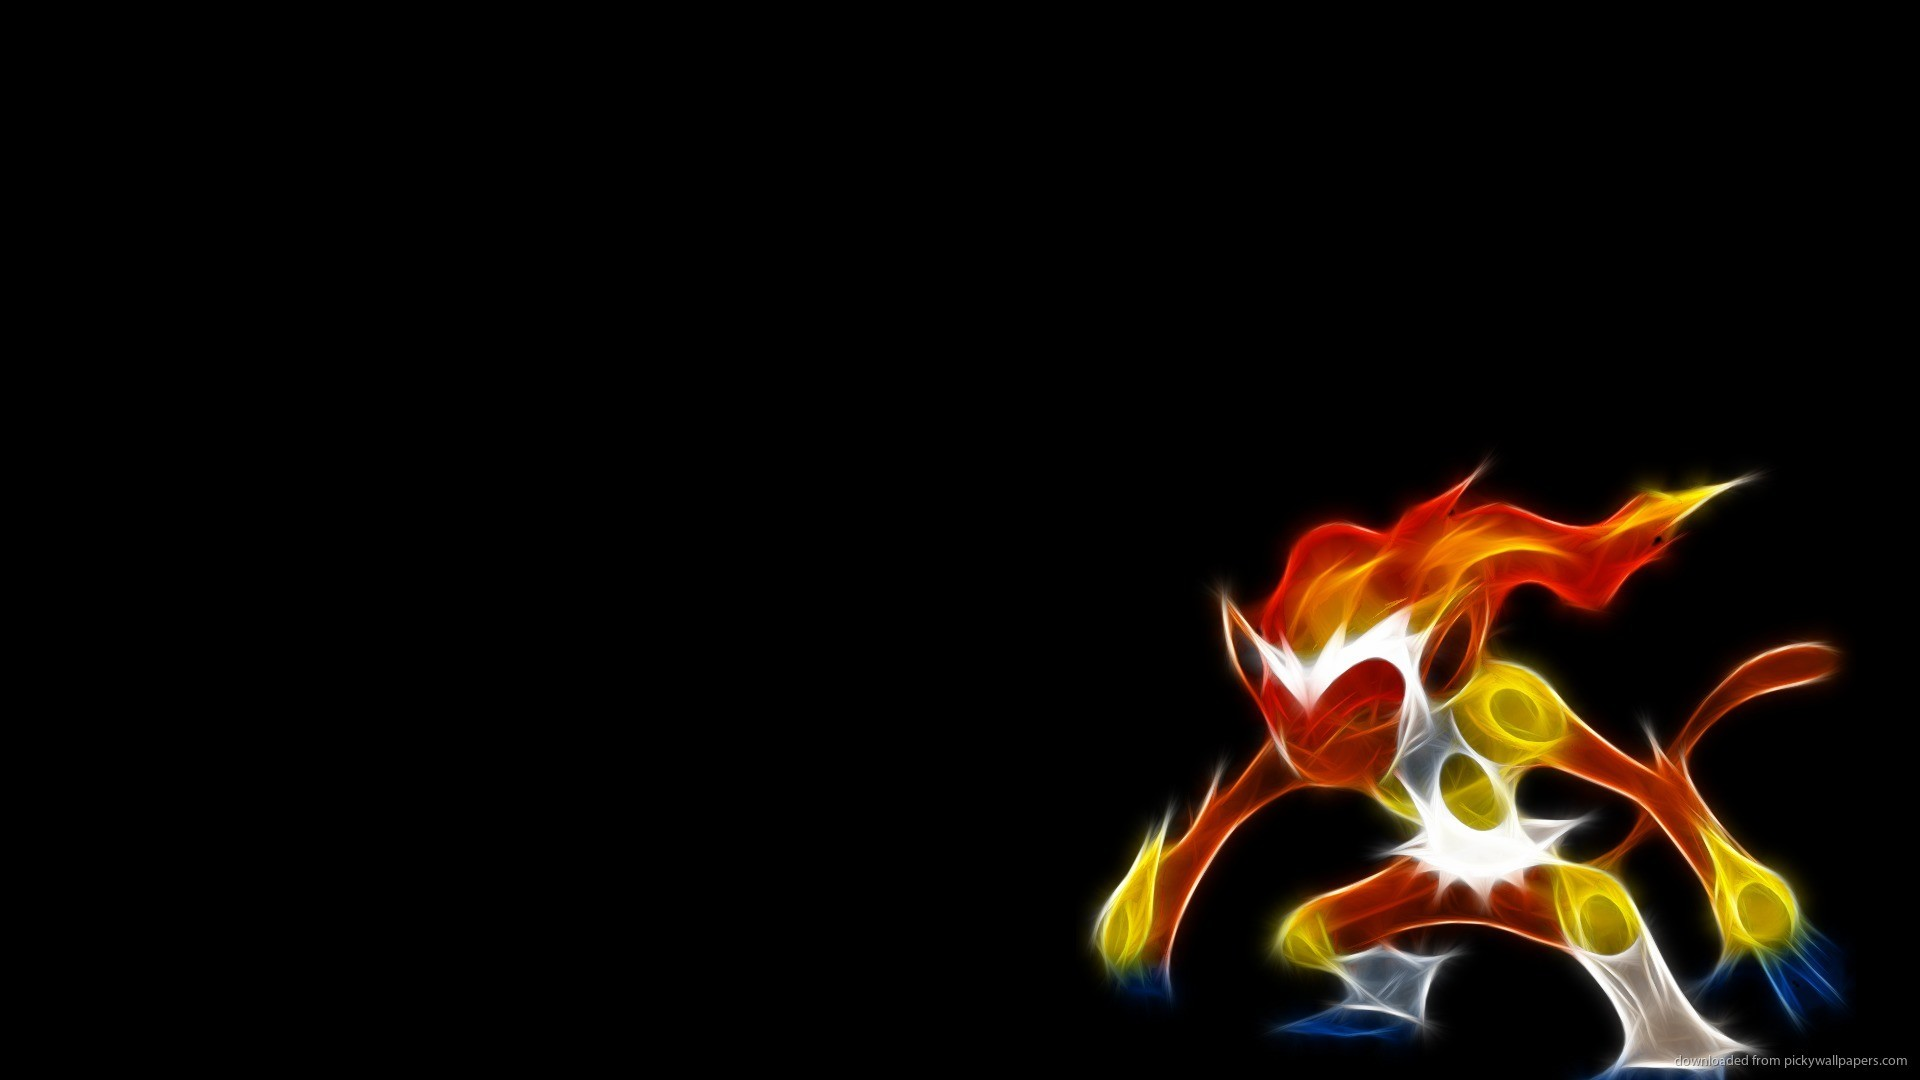 HD Infernape Pokemon Wallpaper wallpaper